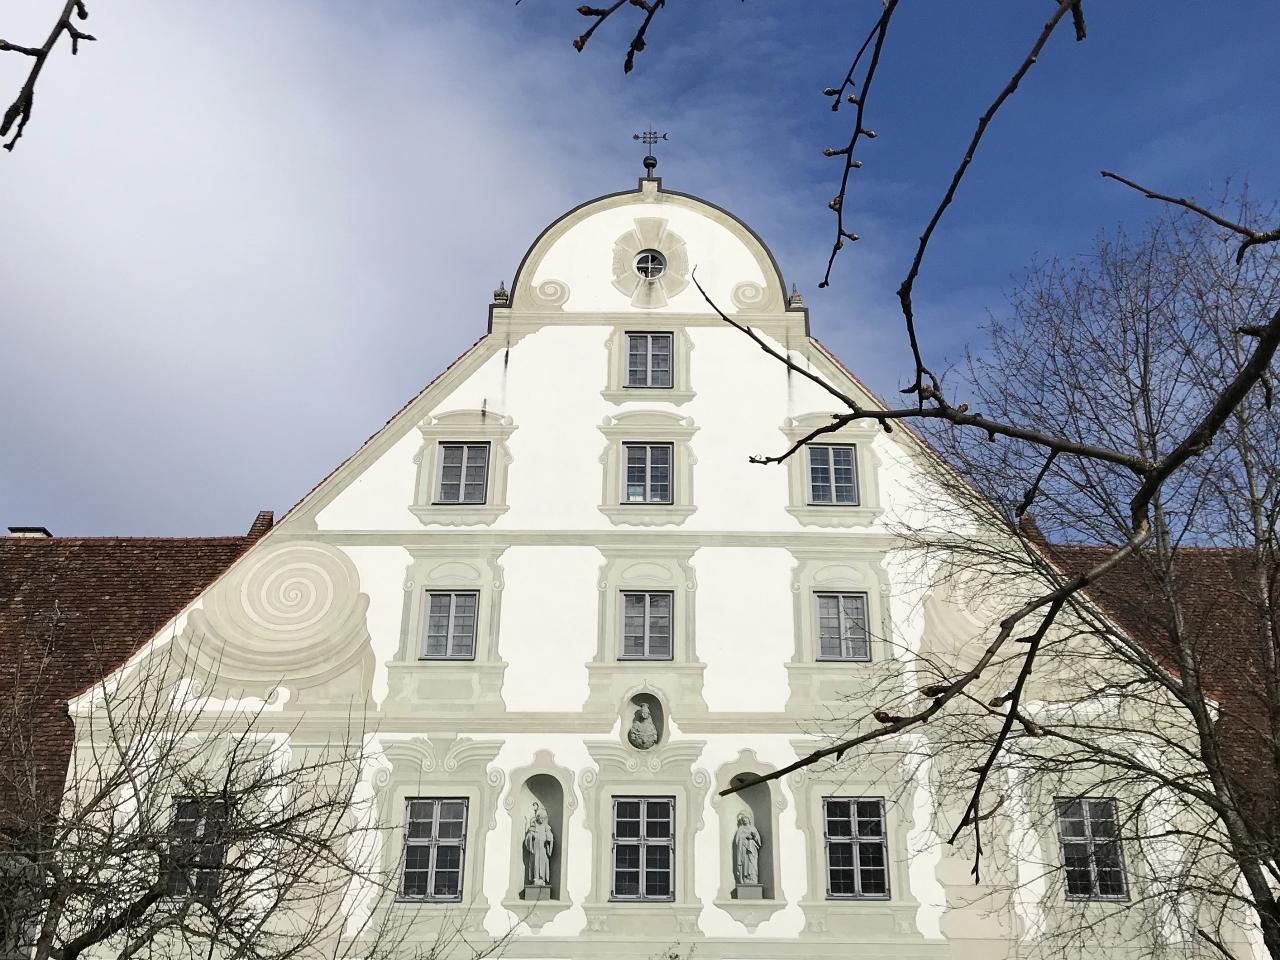 Kloster Benediktbeuern